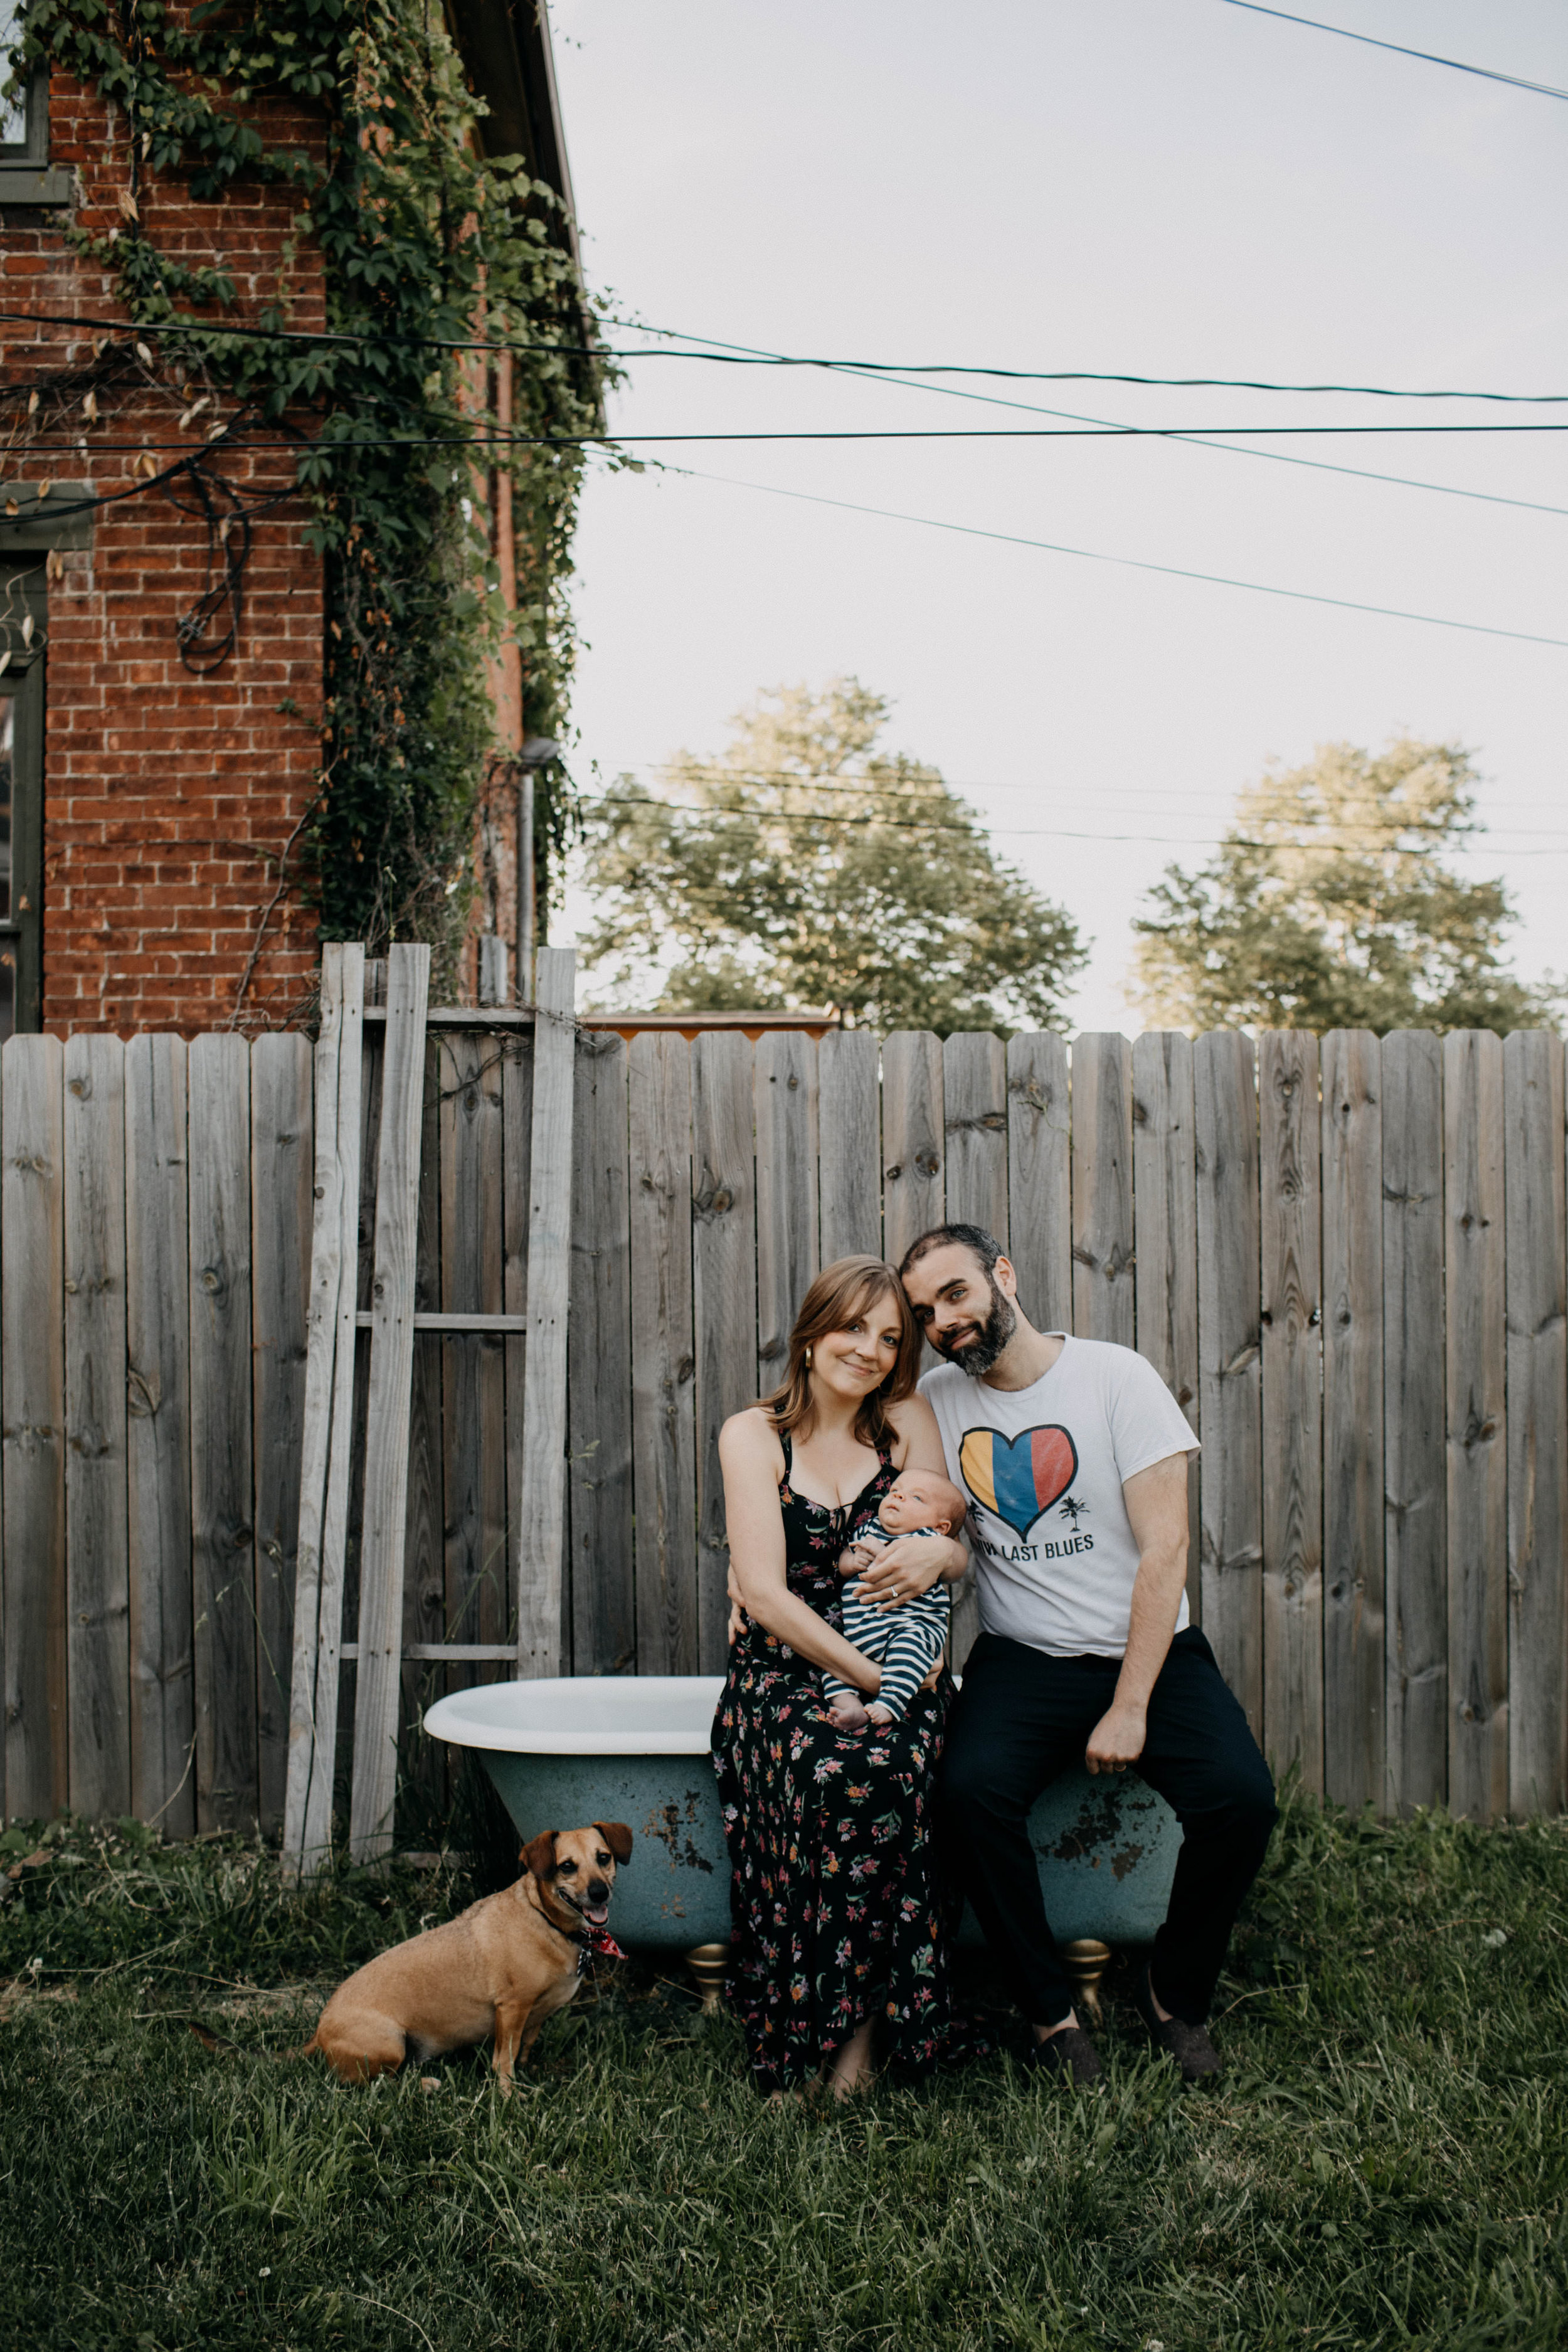 Olde Towne east family photo session columbus ohio photographer19.jpg